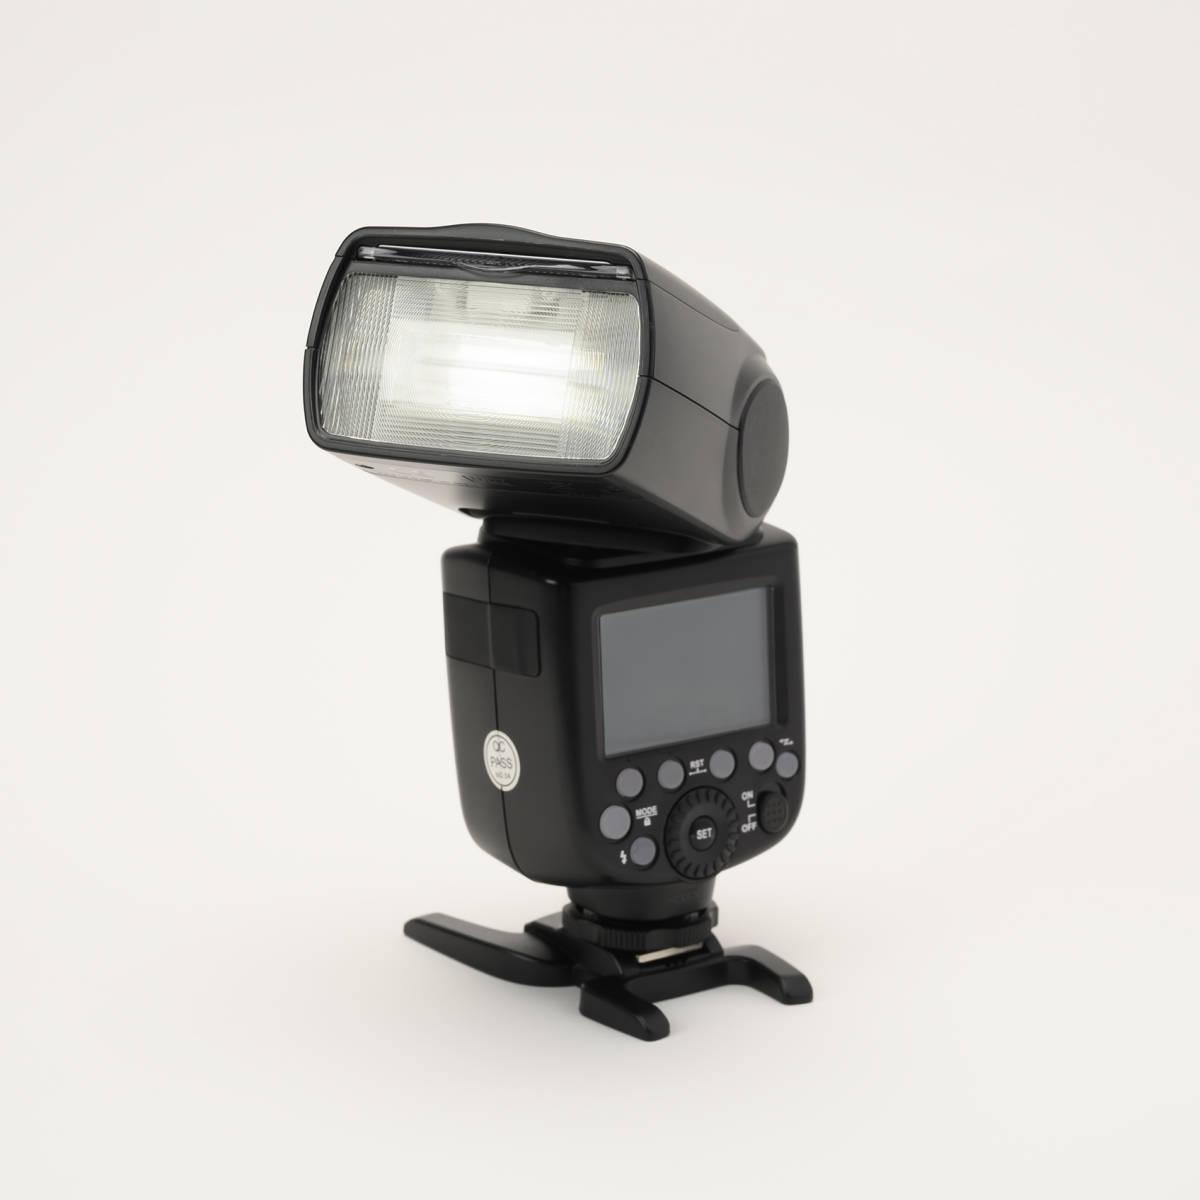 Godox V860IIF 富士カメラ用 カメラフラッシュ 2.4GHz ワイヤレスX1システム TTL GN60 充電式電池_画像7